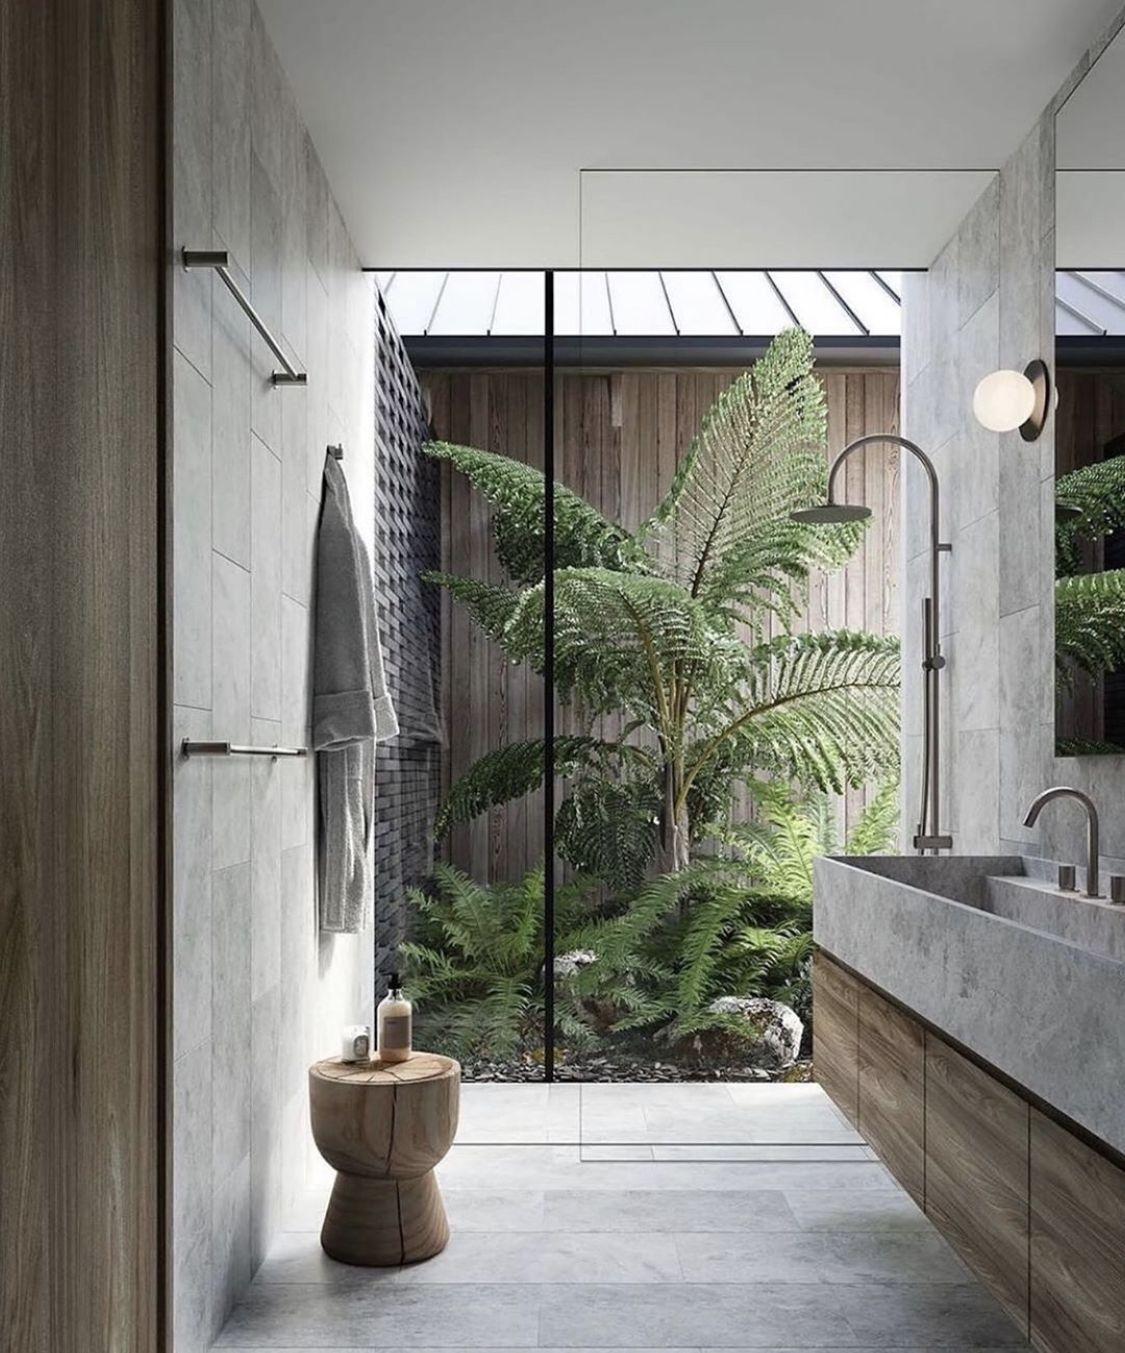 Pin By Hana Abulafi On Bathroom Ideas In 2020 Indoor Outdoor Bathroom Outdoor Bathrooms Architect Design